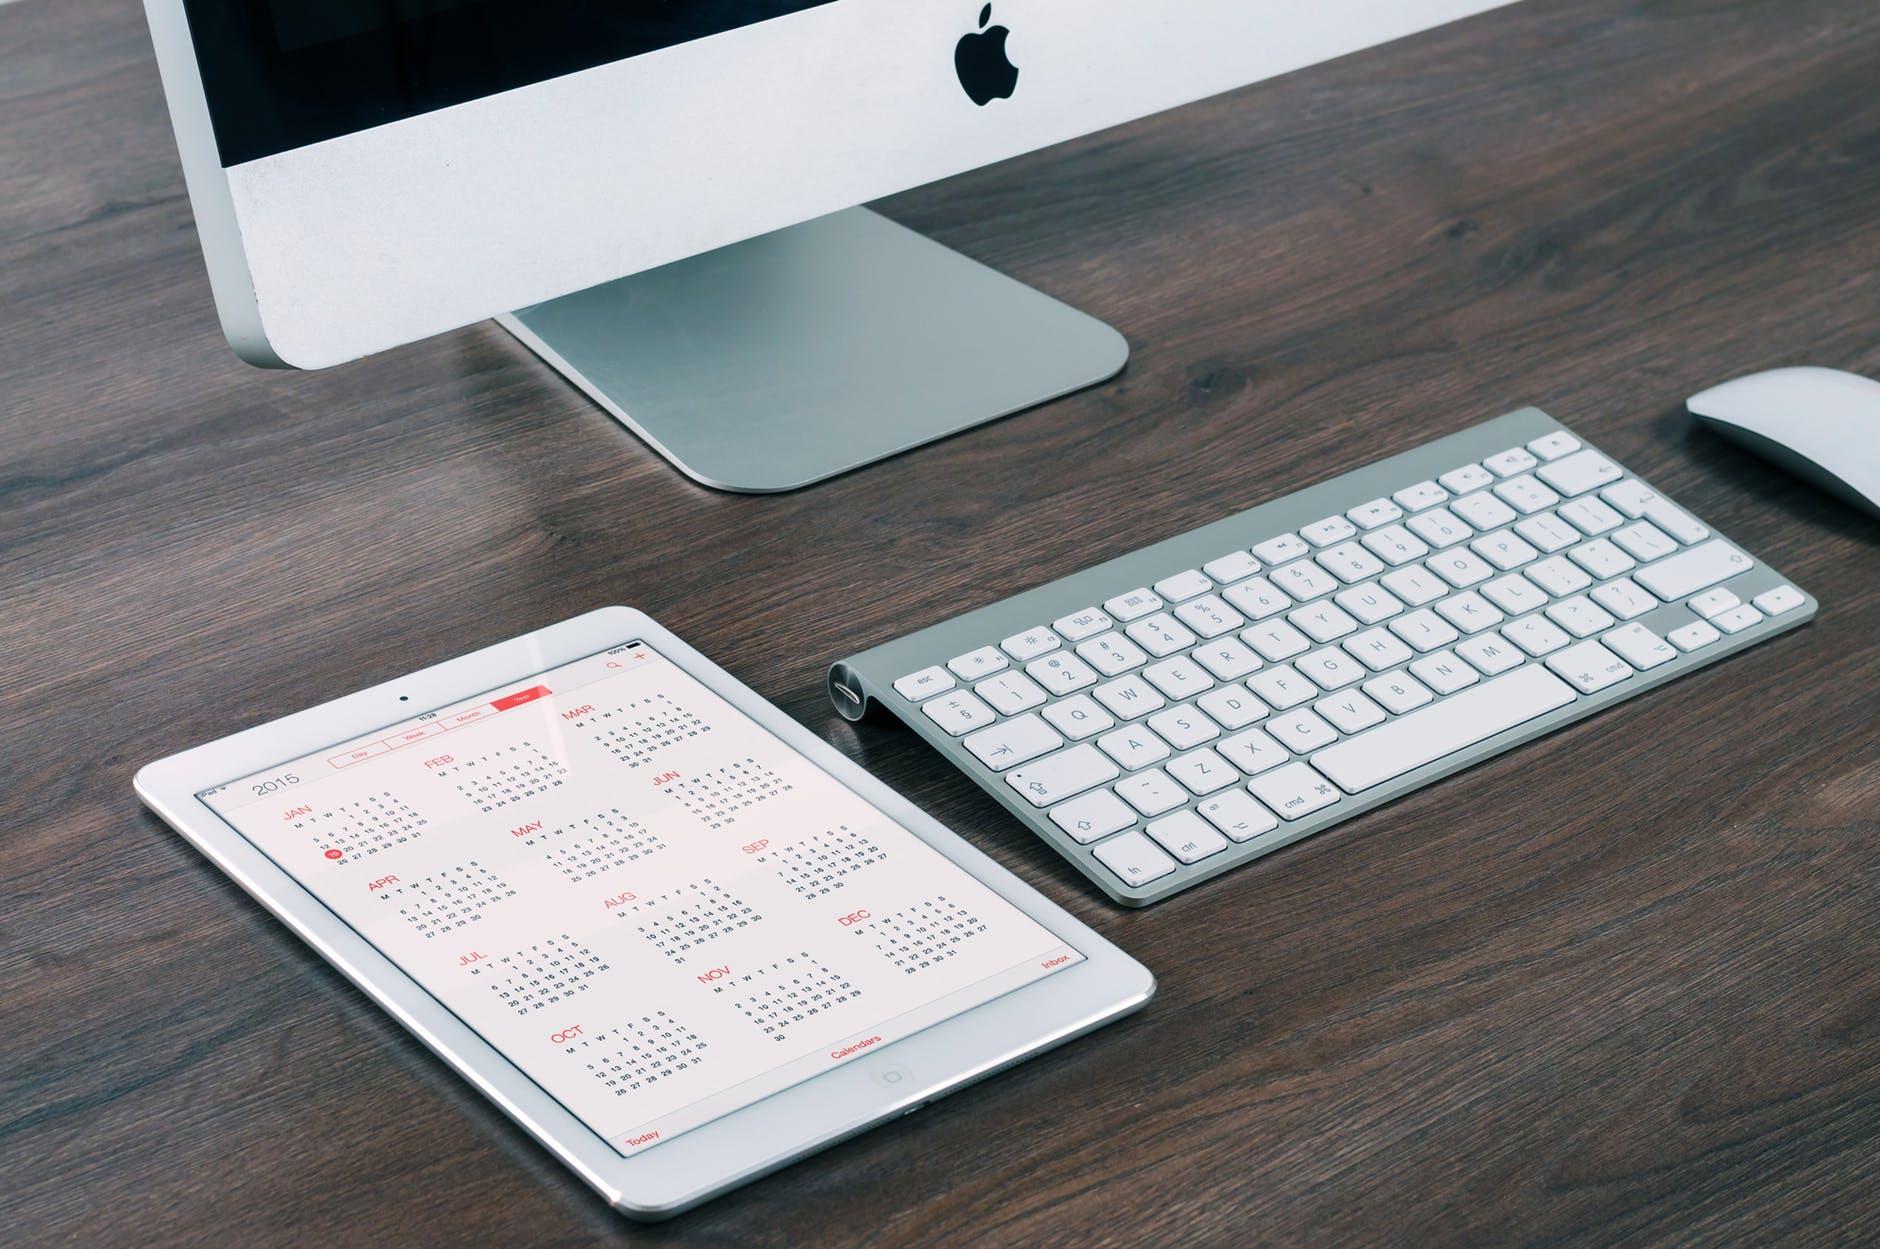 Productively Managing an Executive's Calendar